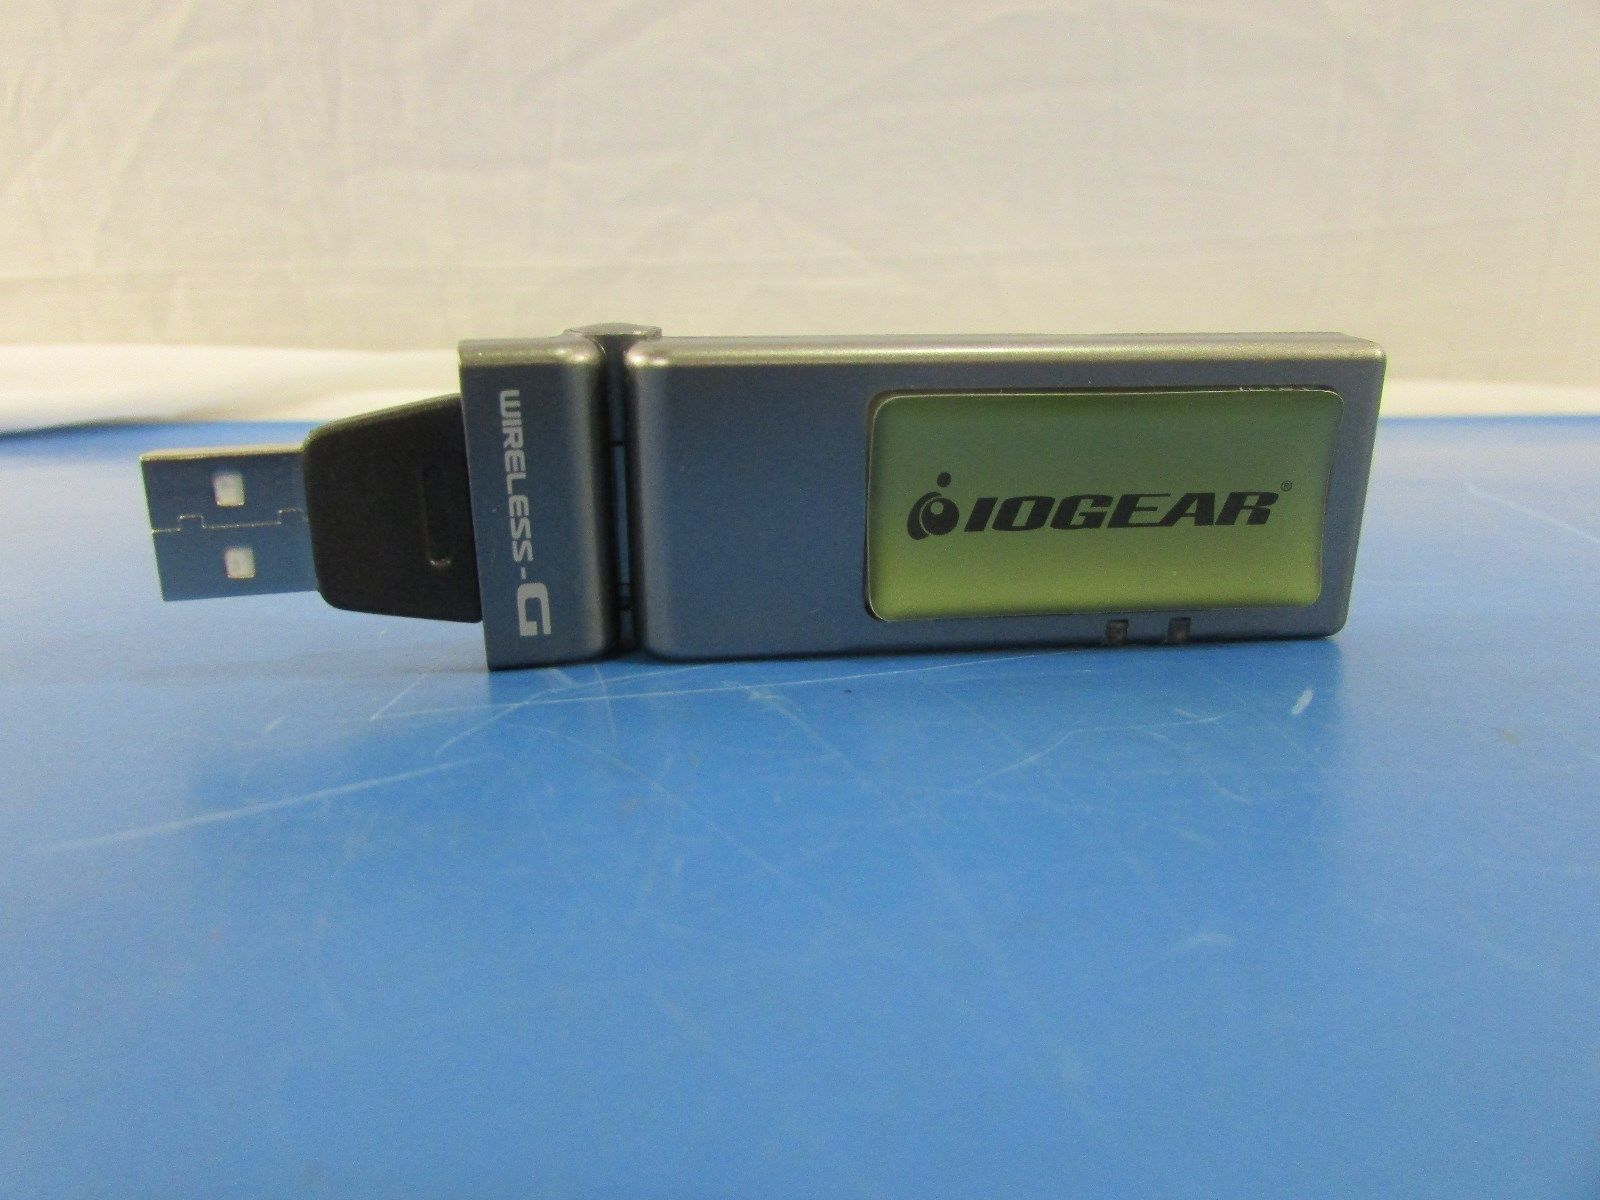 IOGear Wireless-G USB 2.0 300 Degree Flex and 50 similar items